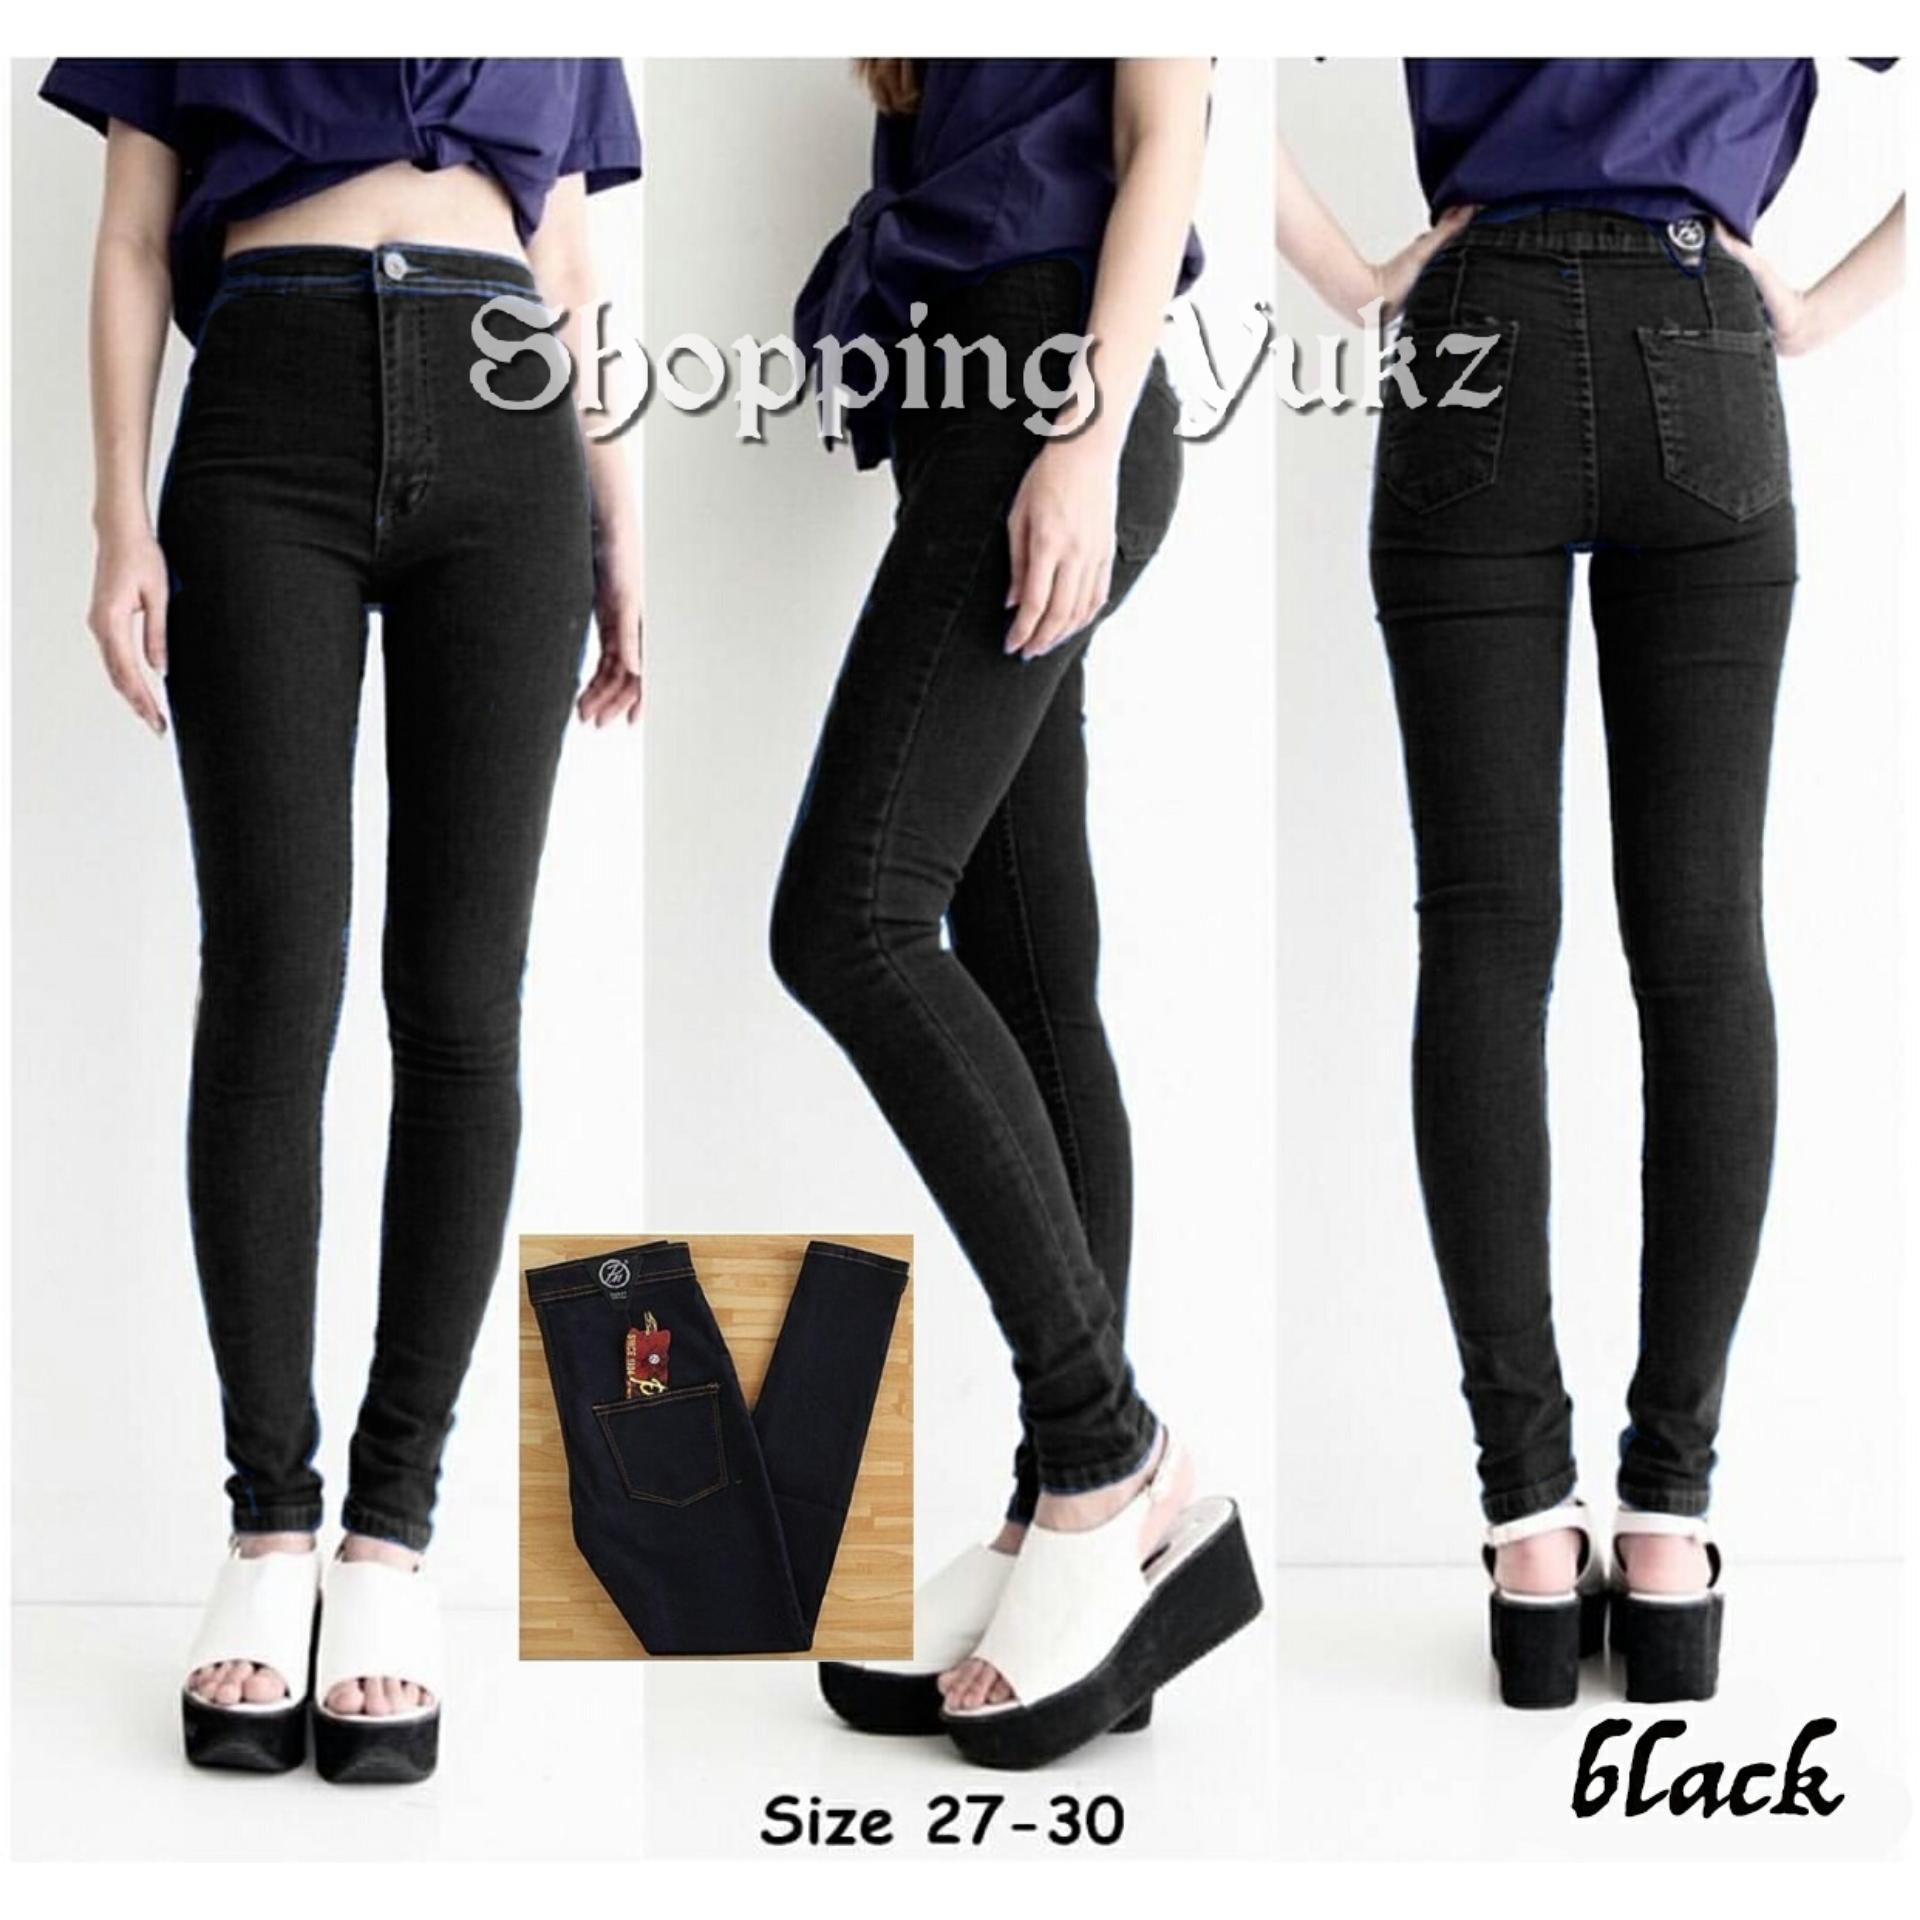 Review Tentang Shopping Yukz Celana Jeans Wanita Skinny Highwaist Hunny Hitam Kualitas Premium Celana Panjang Jeans Wanita Highwaist Jeans Celana Wanita Jeans Wanita Long Pants Highwaist